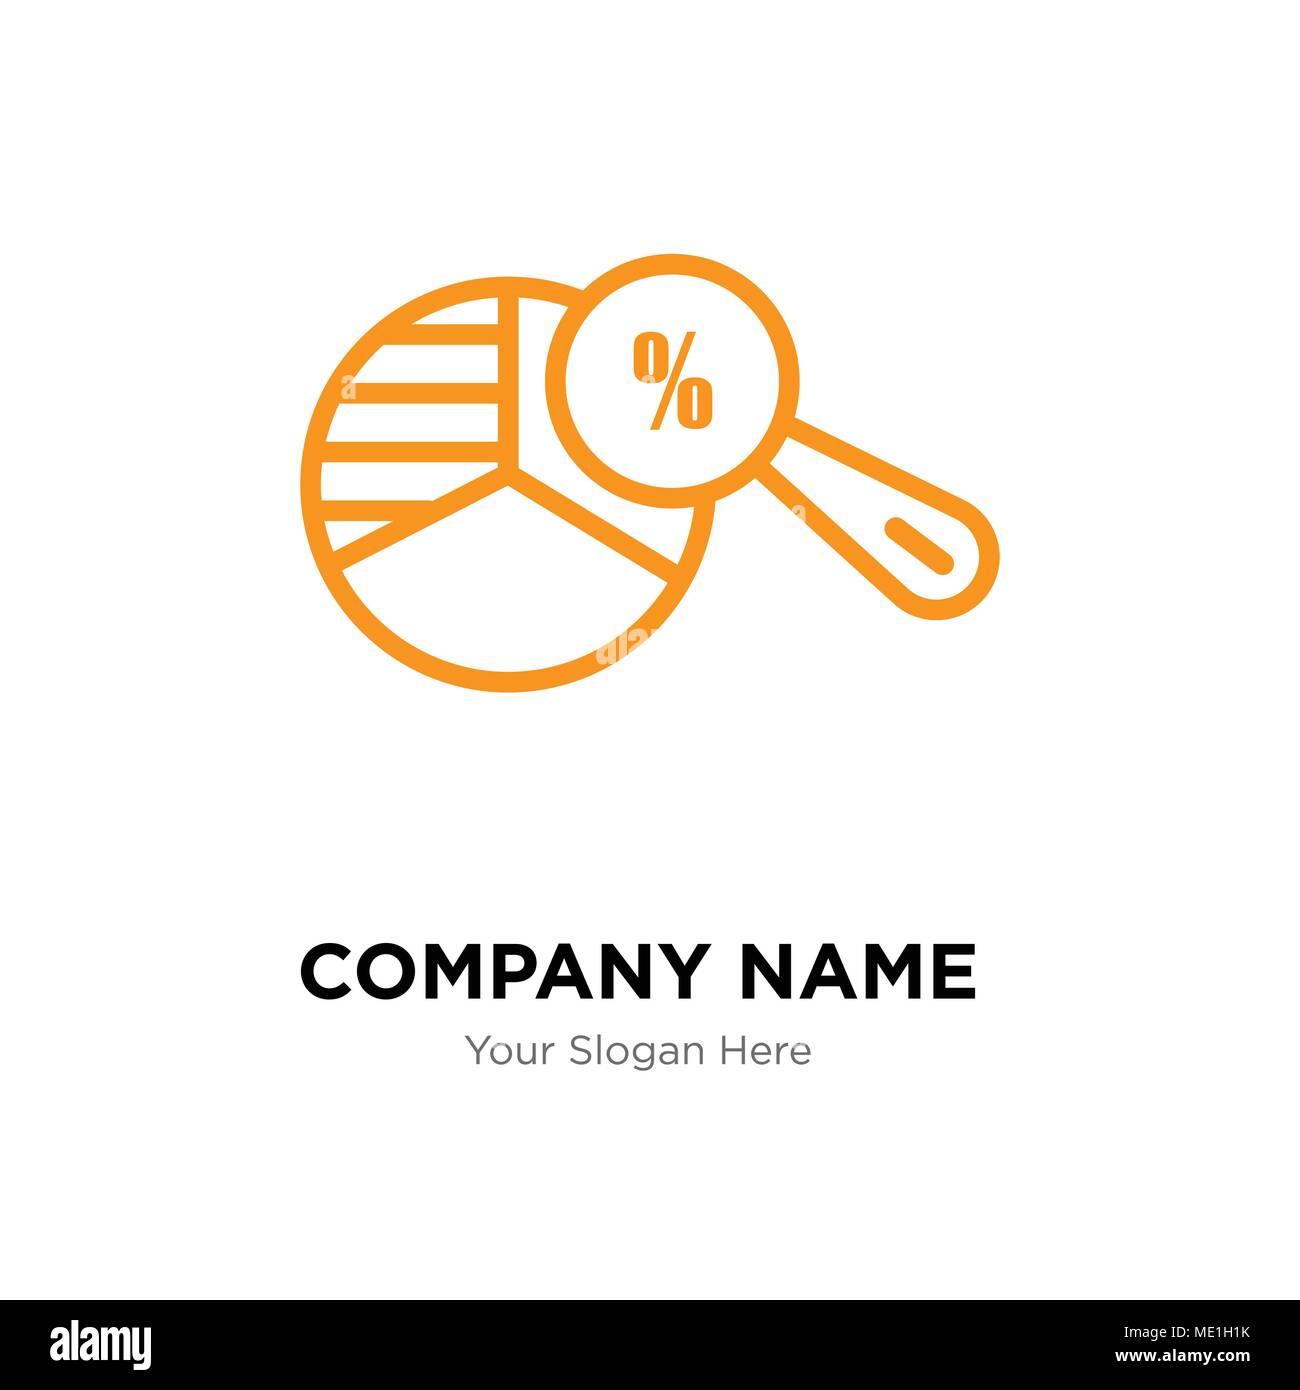 Pie Chart Analysis Company Logo Design Template Business Corporate